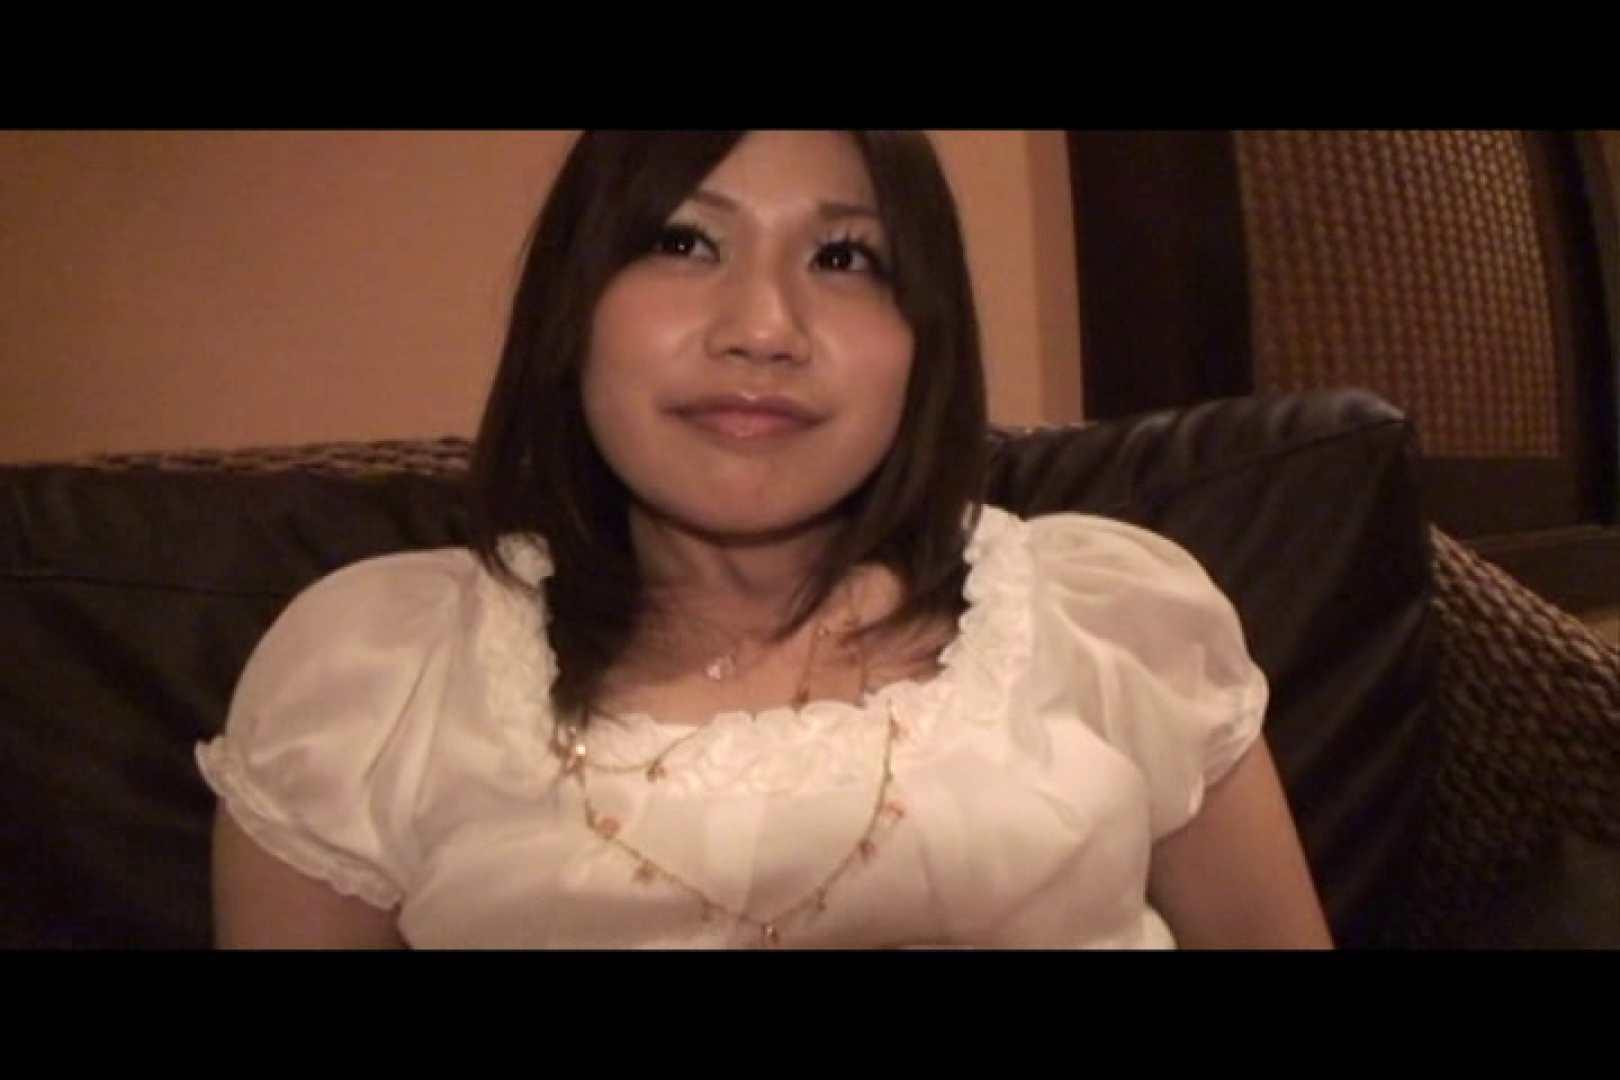 JDハンター全国ツアー vol.048 前編 女子大生のエロ動画  80PIX 48